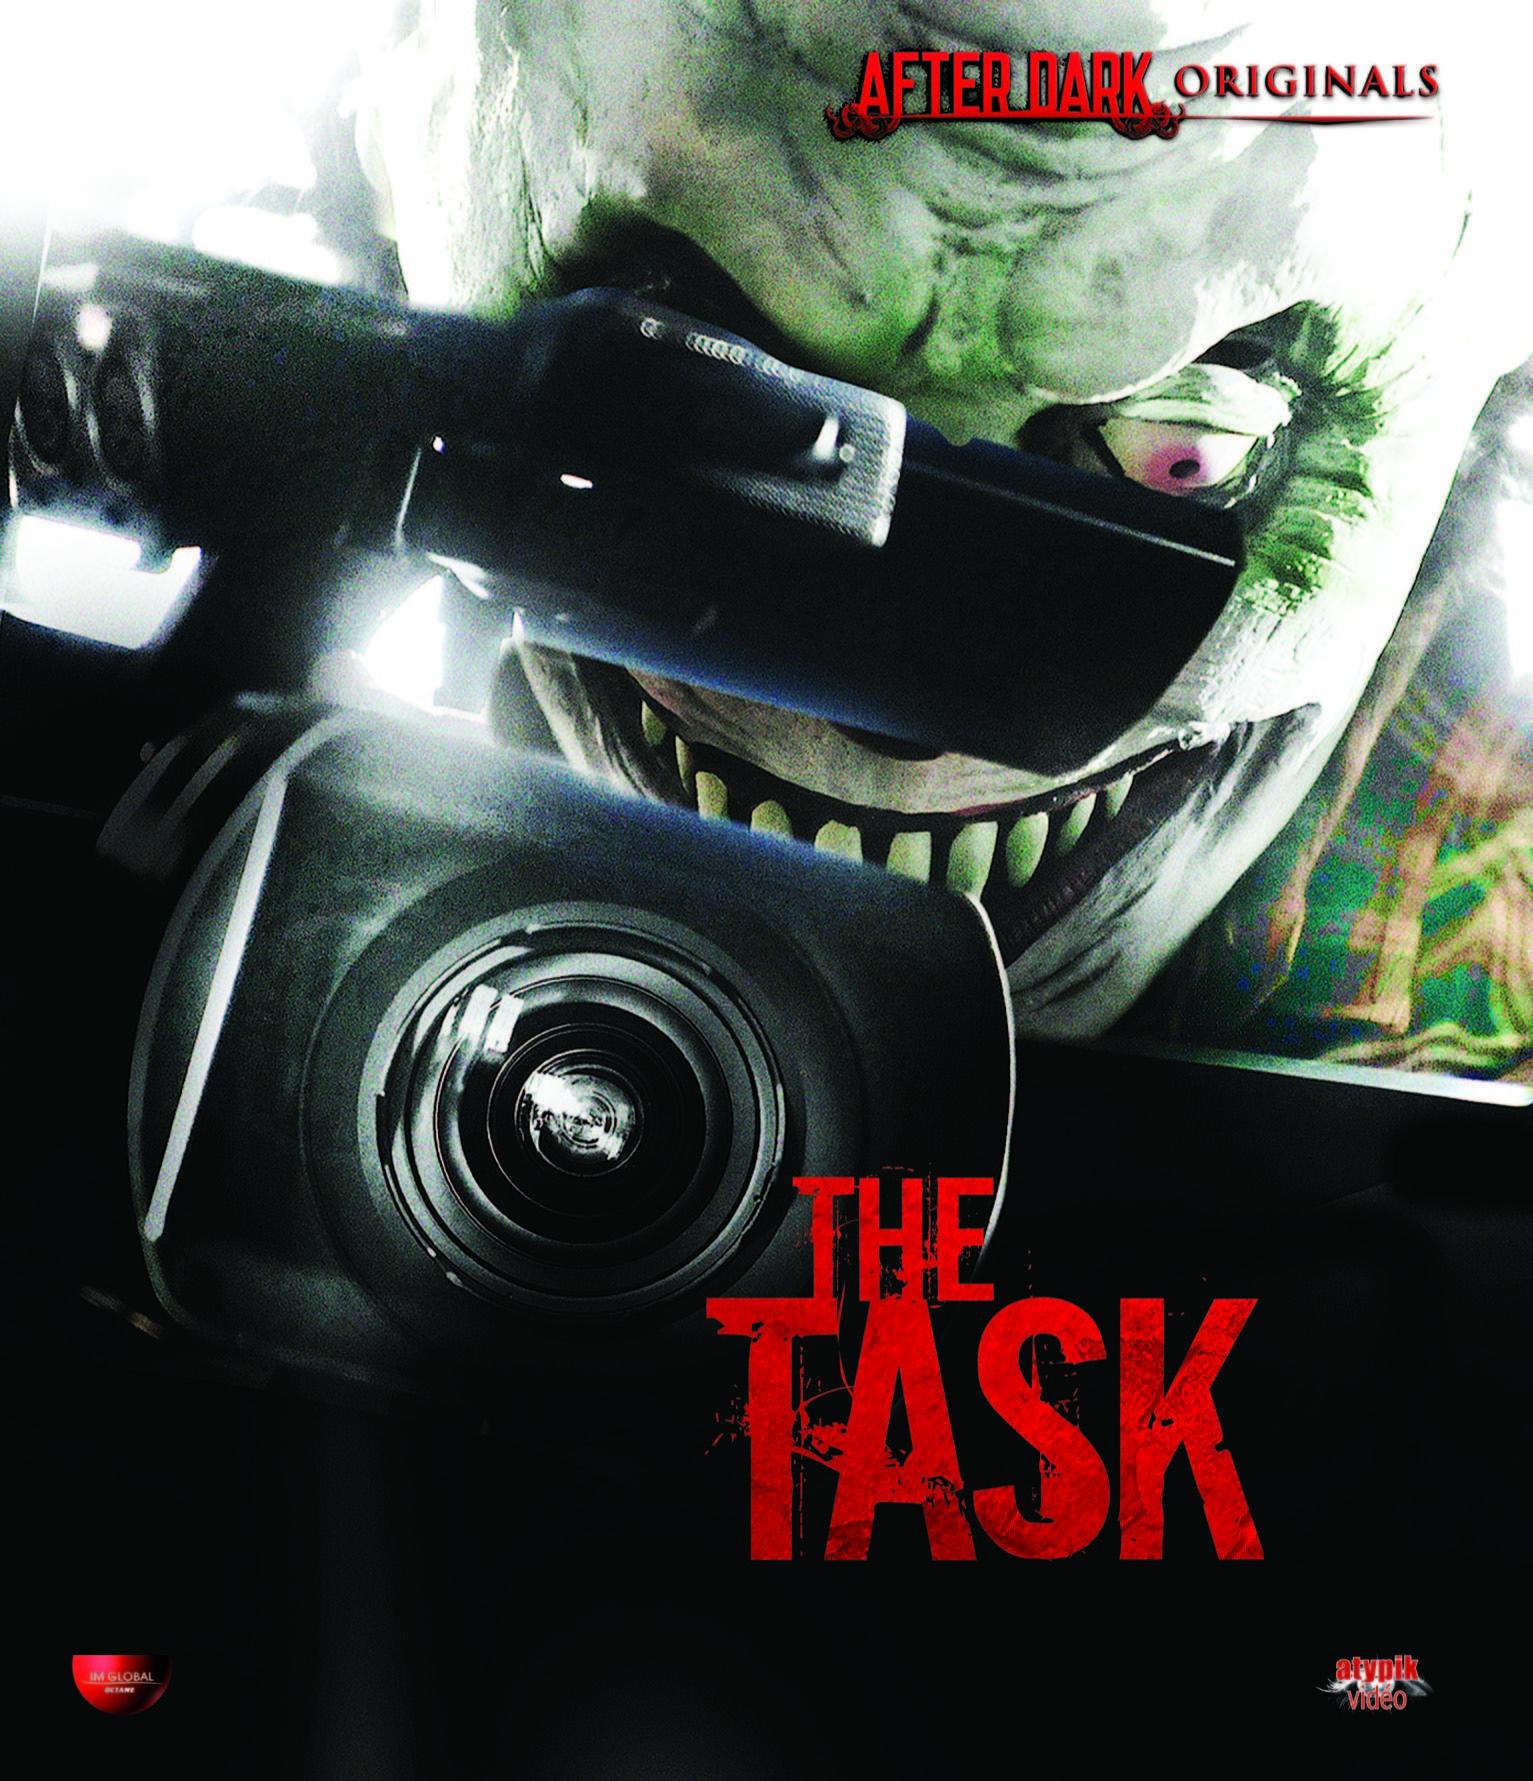 THE TASK BLU RAY